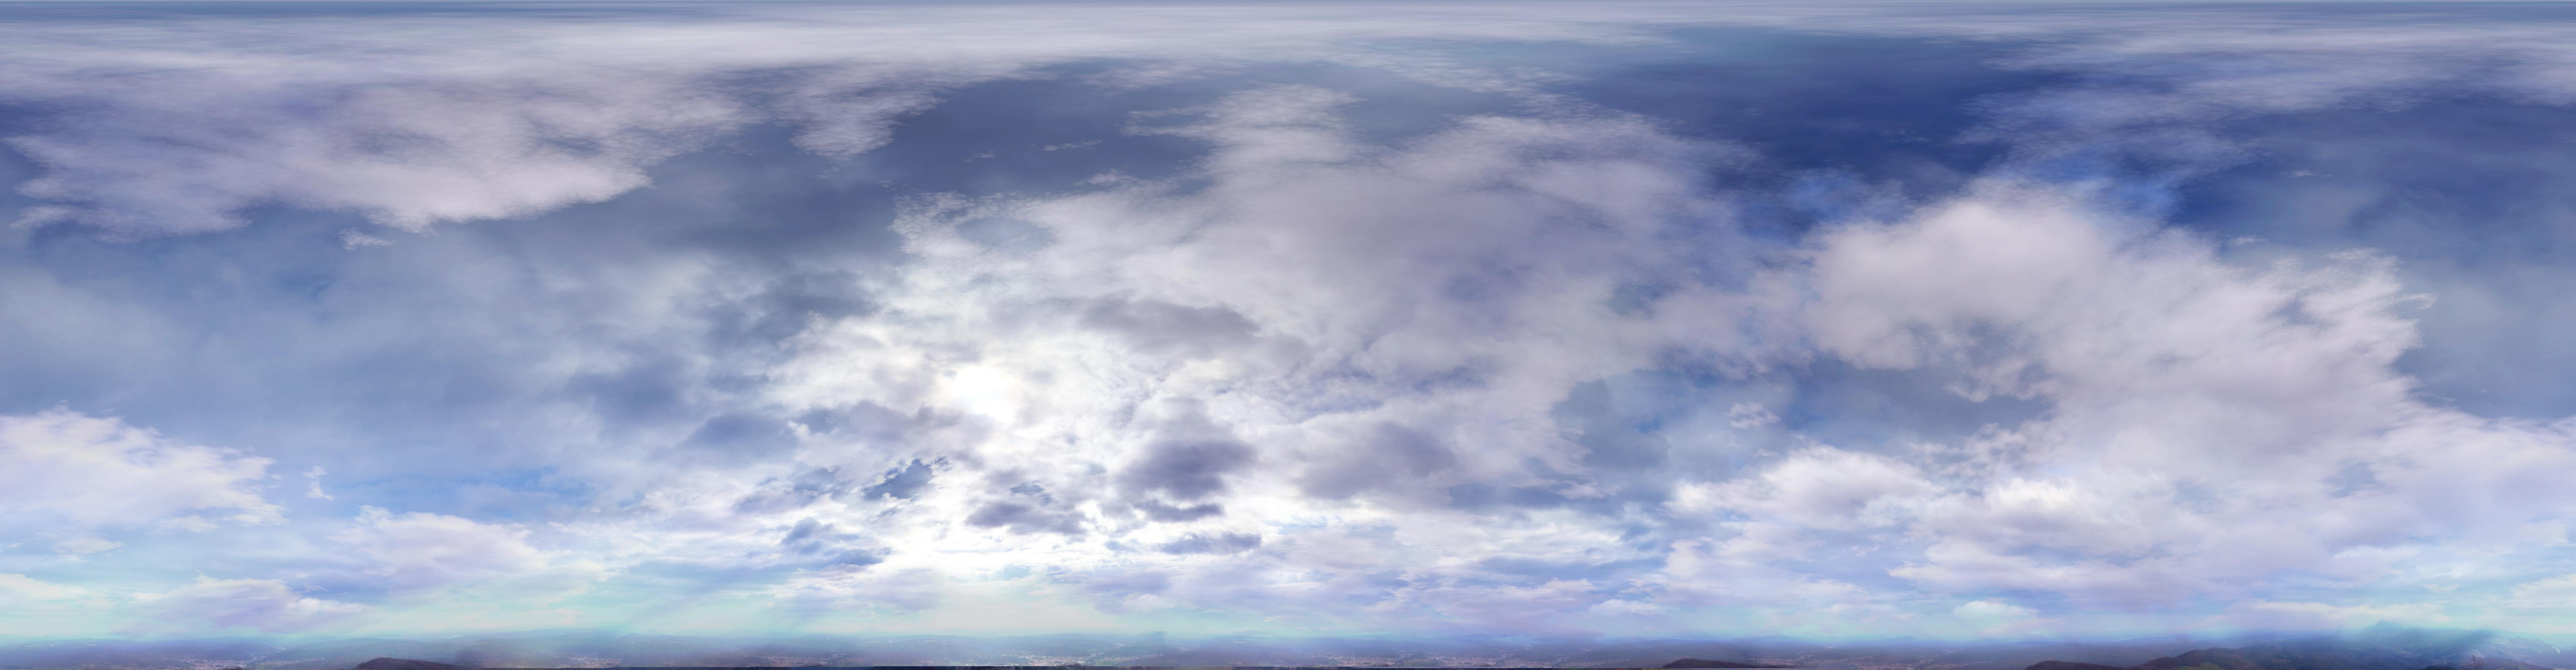 Hdri cloudy sky free download